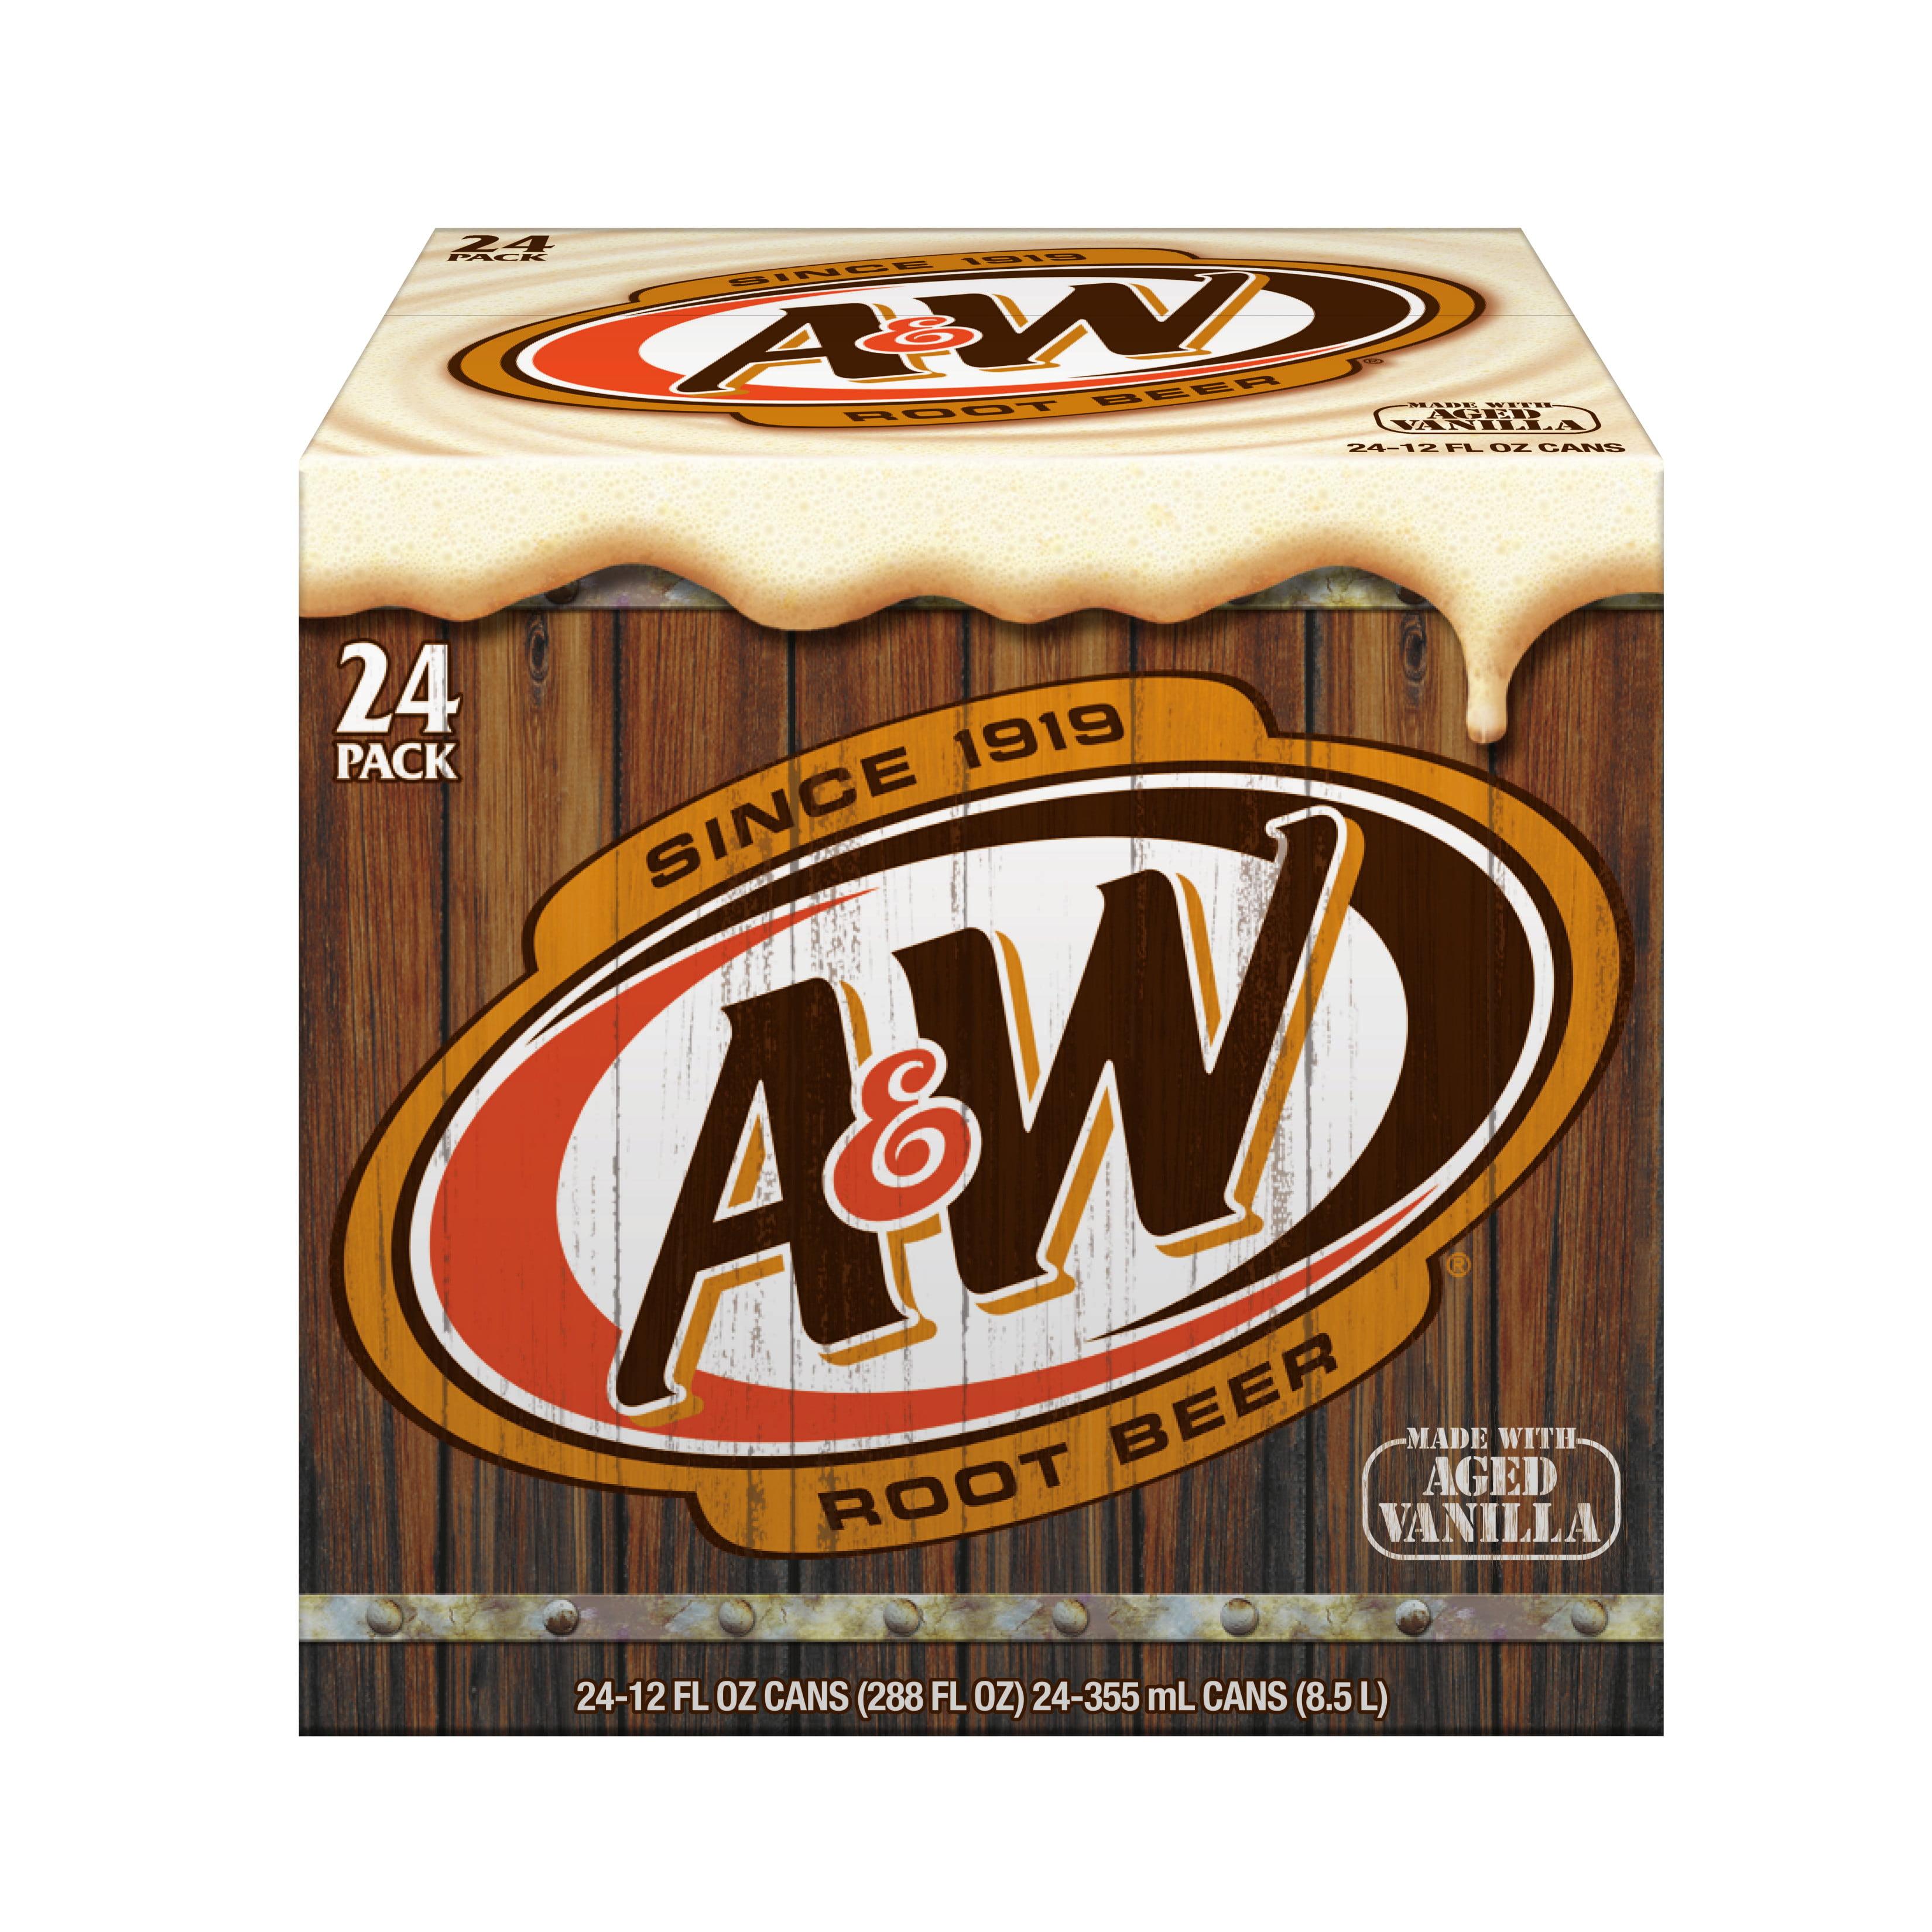 Image of A Root Beer, 12 fl oz, 24 pack